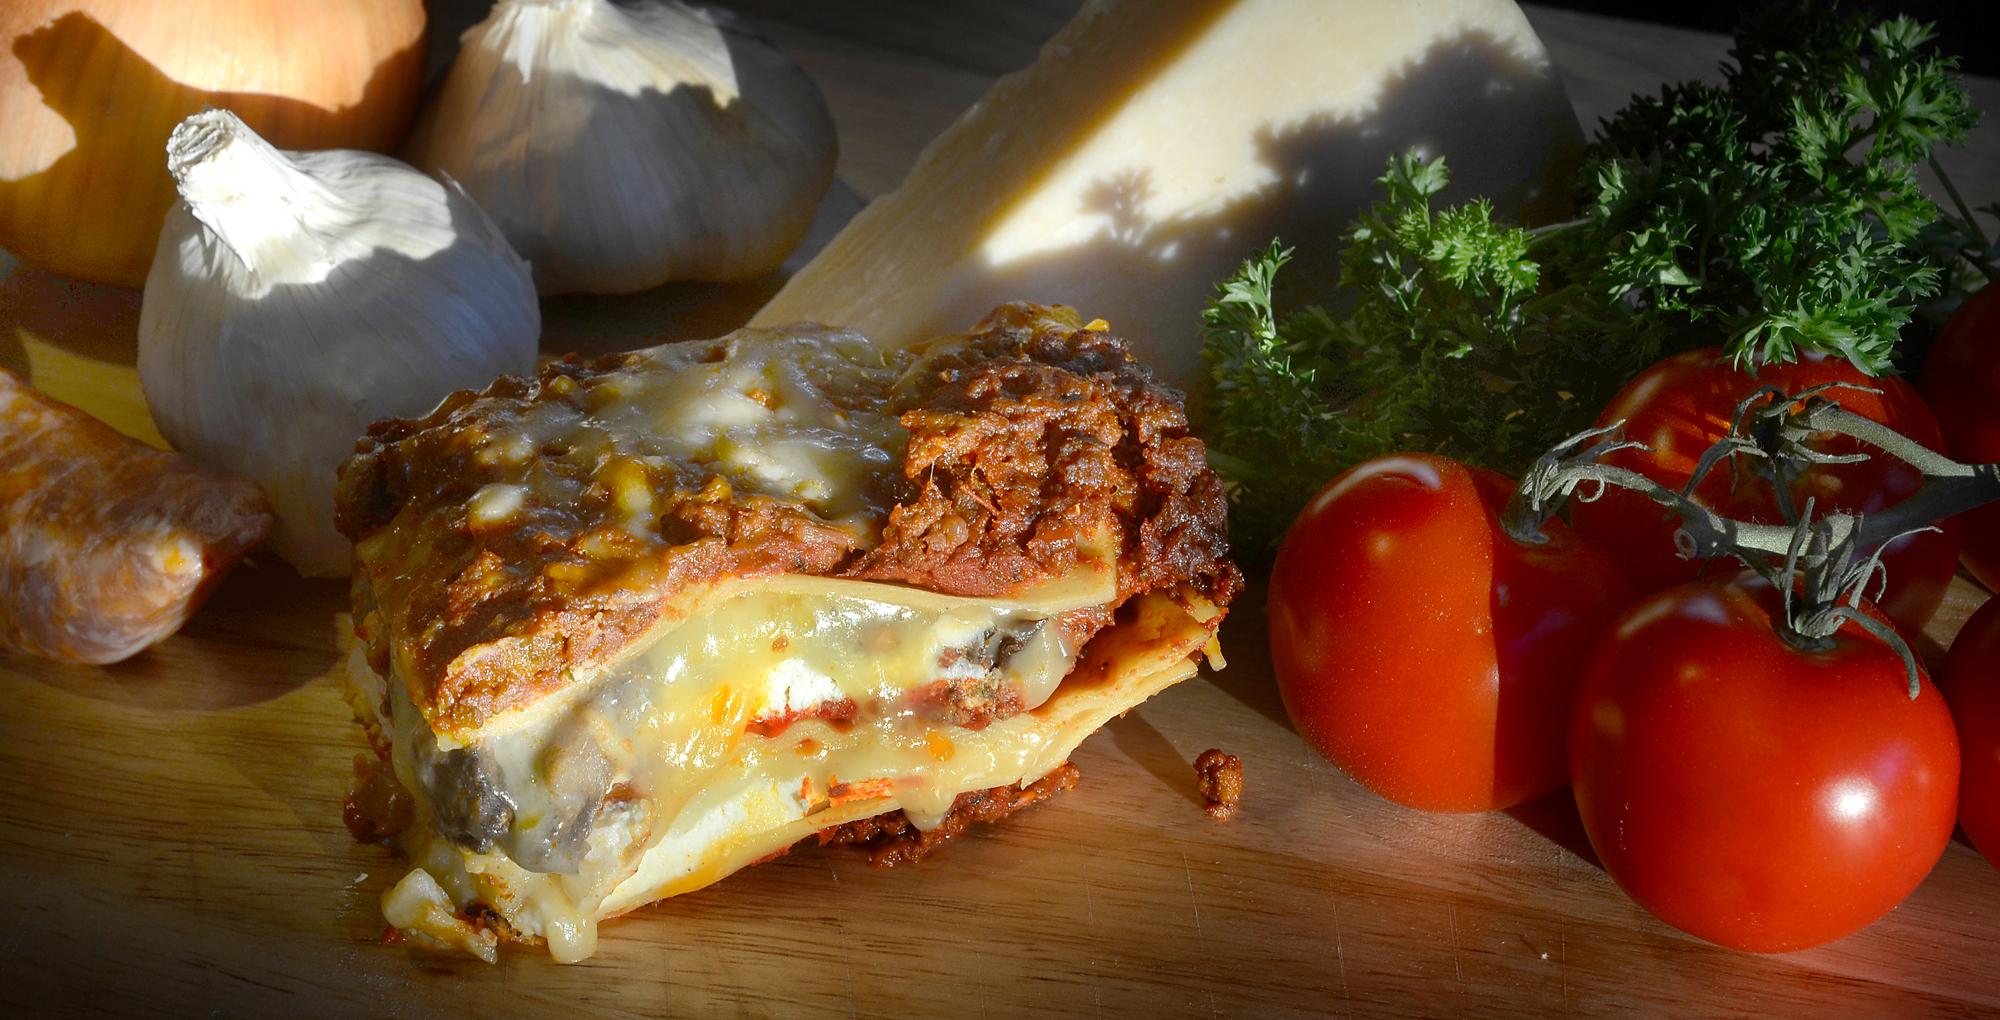 Michael McCollum 10/14/13 Lasagna, and ingredients.